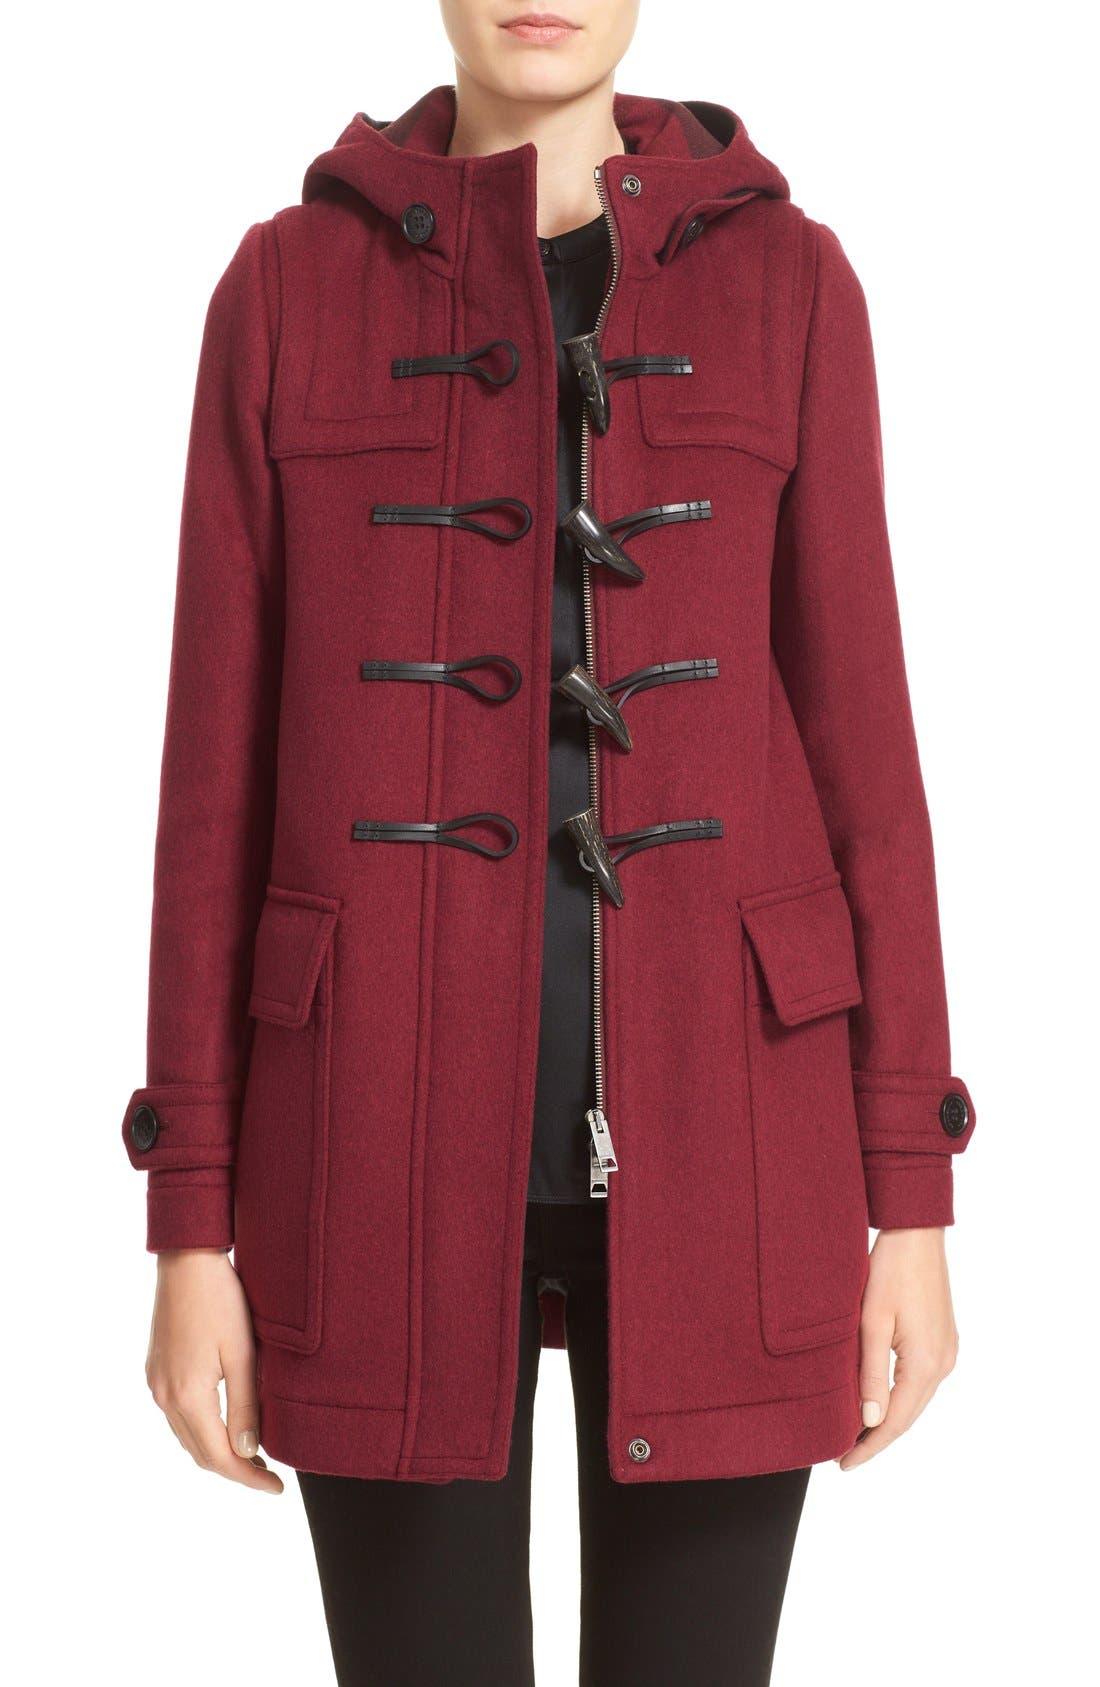 Alternate Image 1 Selected - Burberry 'Baysbrooke' Wool Duffle Coat